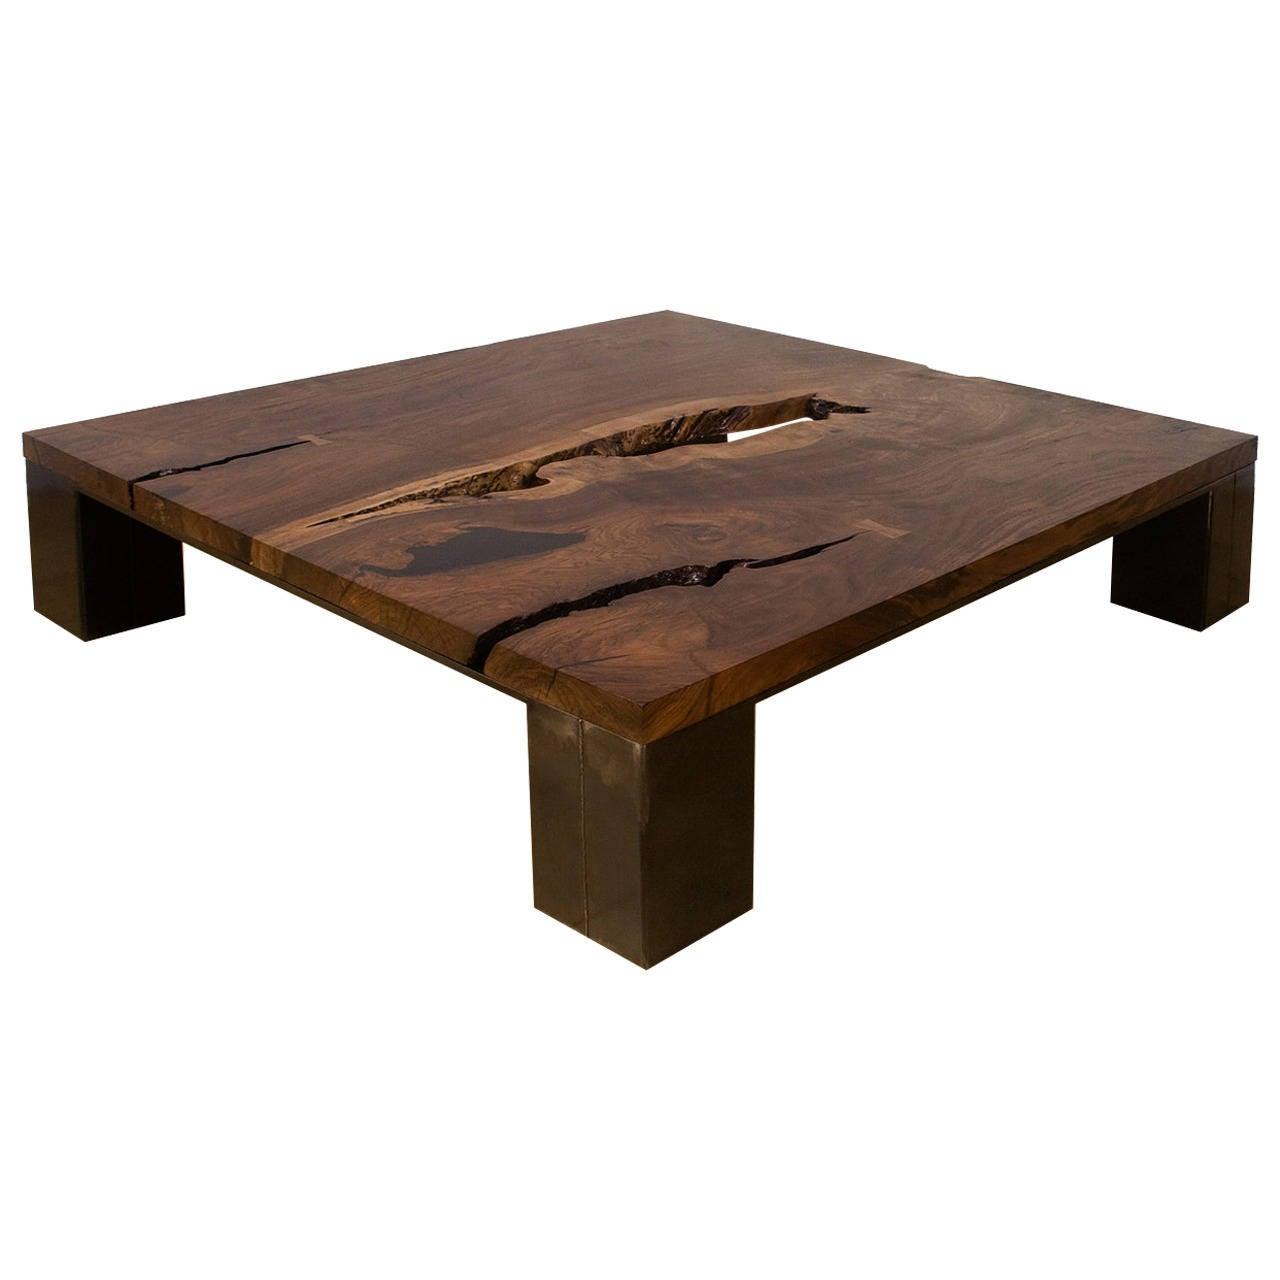 Kong Coffee Table by Uhuru Design, Claro Walnut, Hand Blackened Steel